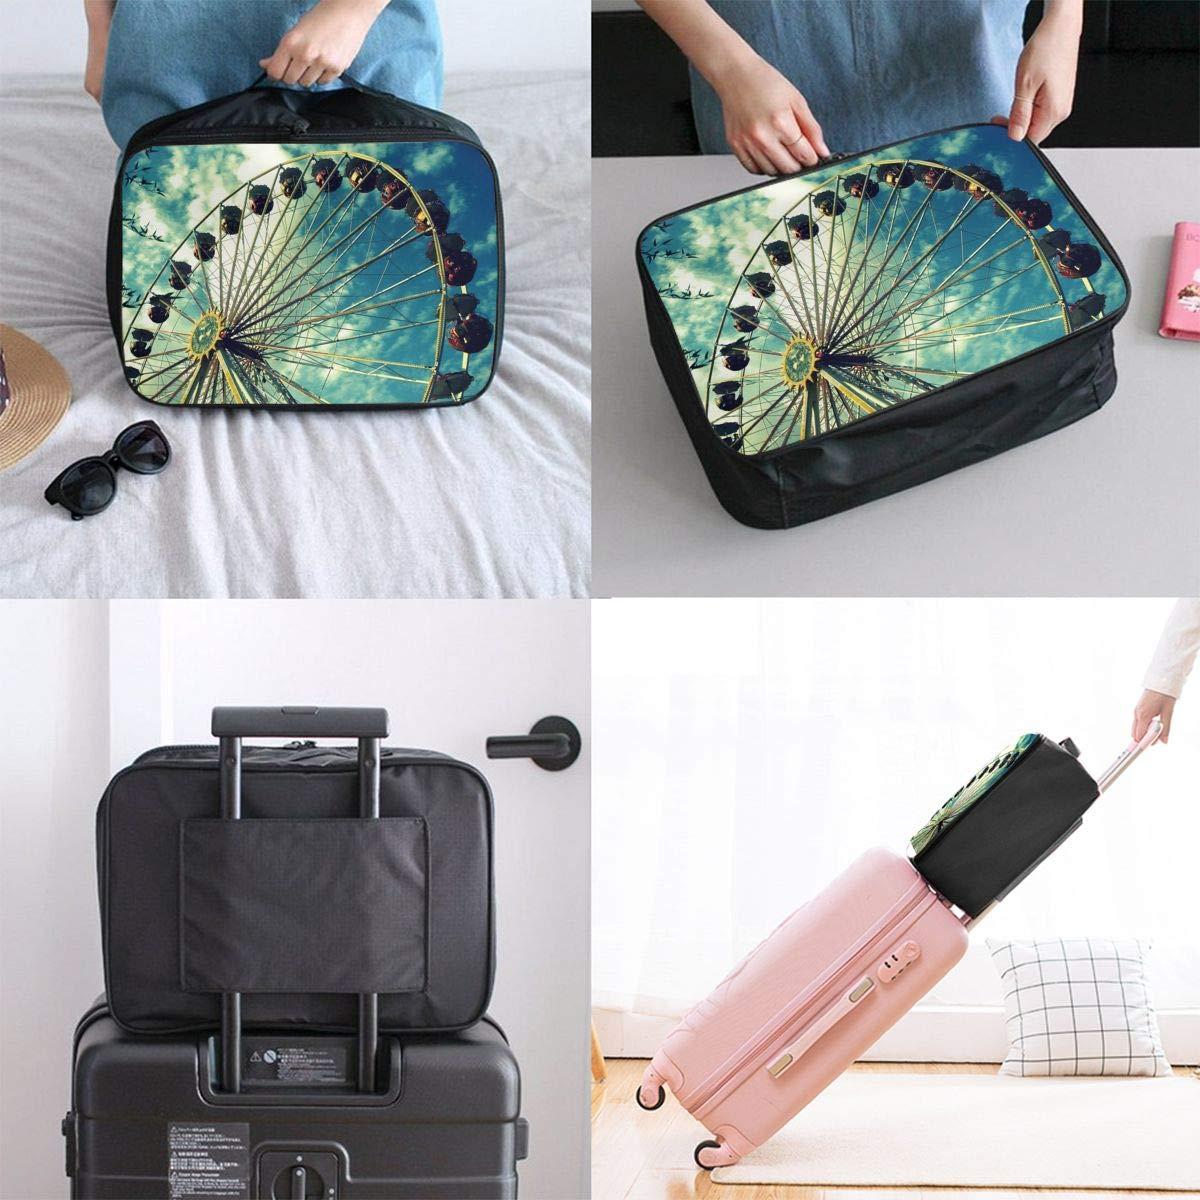 Travel Luggage Duffle Bag Lightweight Portable Handbag Ferris Wheel Pattern Large Capacity Waterproof Foldable Storage Tote